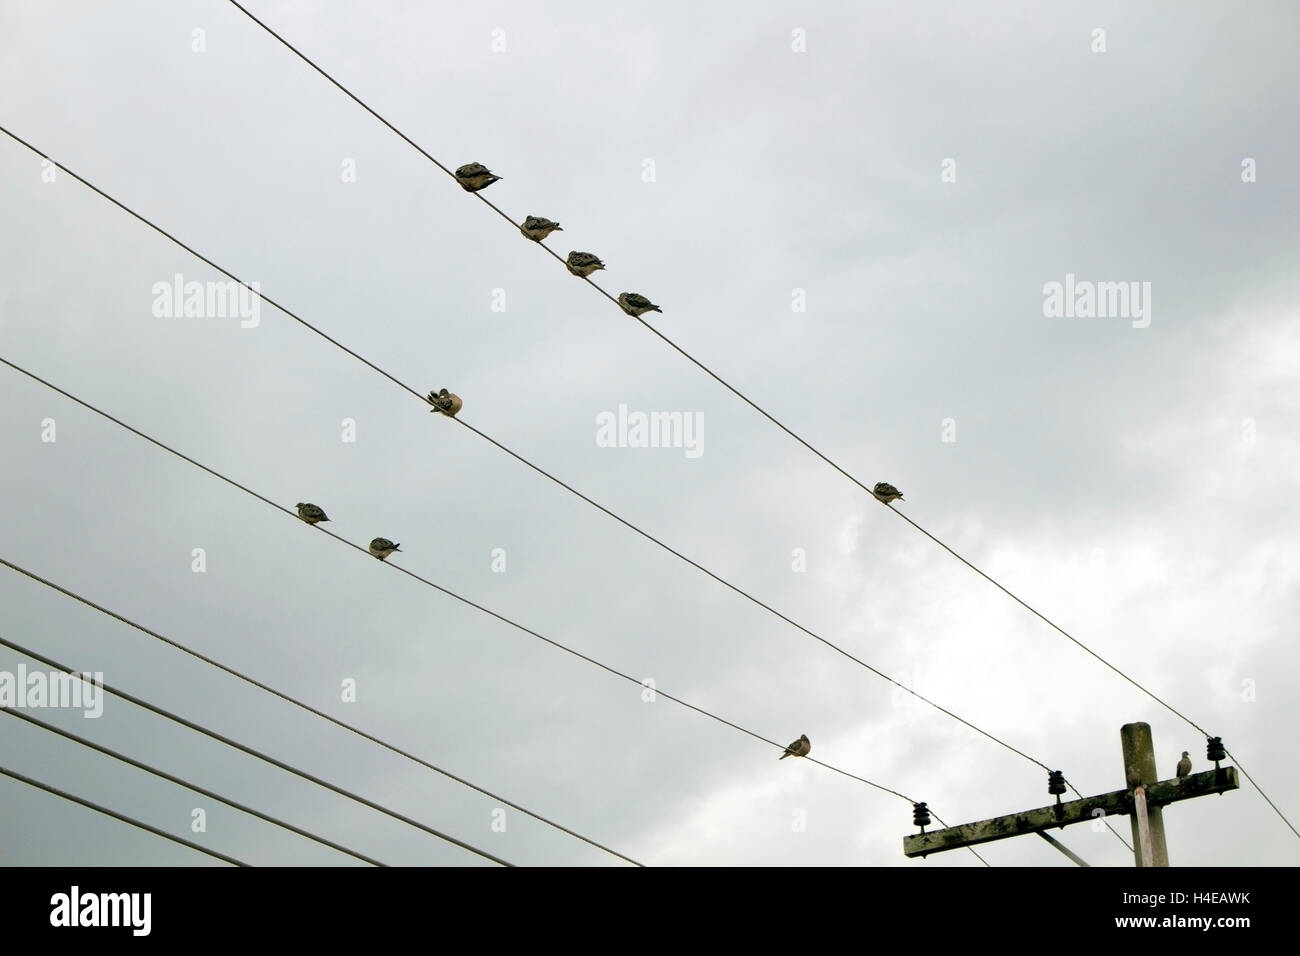 Birds On Phone Wires Stock Photos & Birds On Phone Wires Stock ...